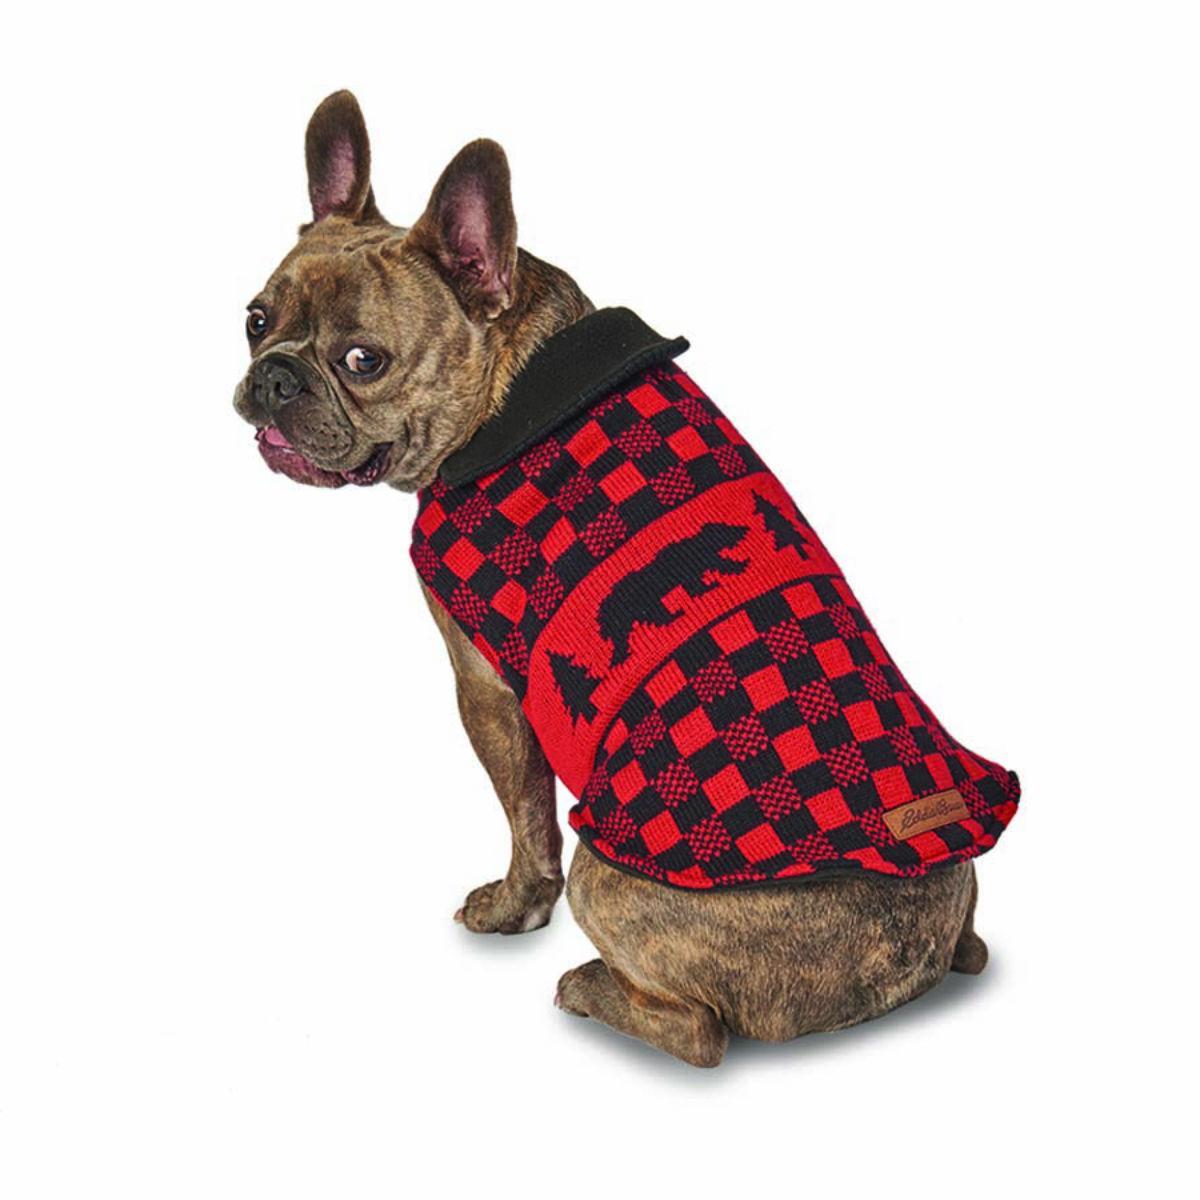 Eddie Bauer Woods Creek Fleece Lined Dog Sweater